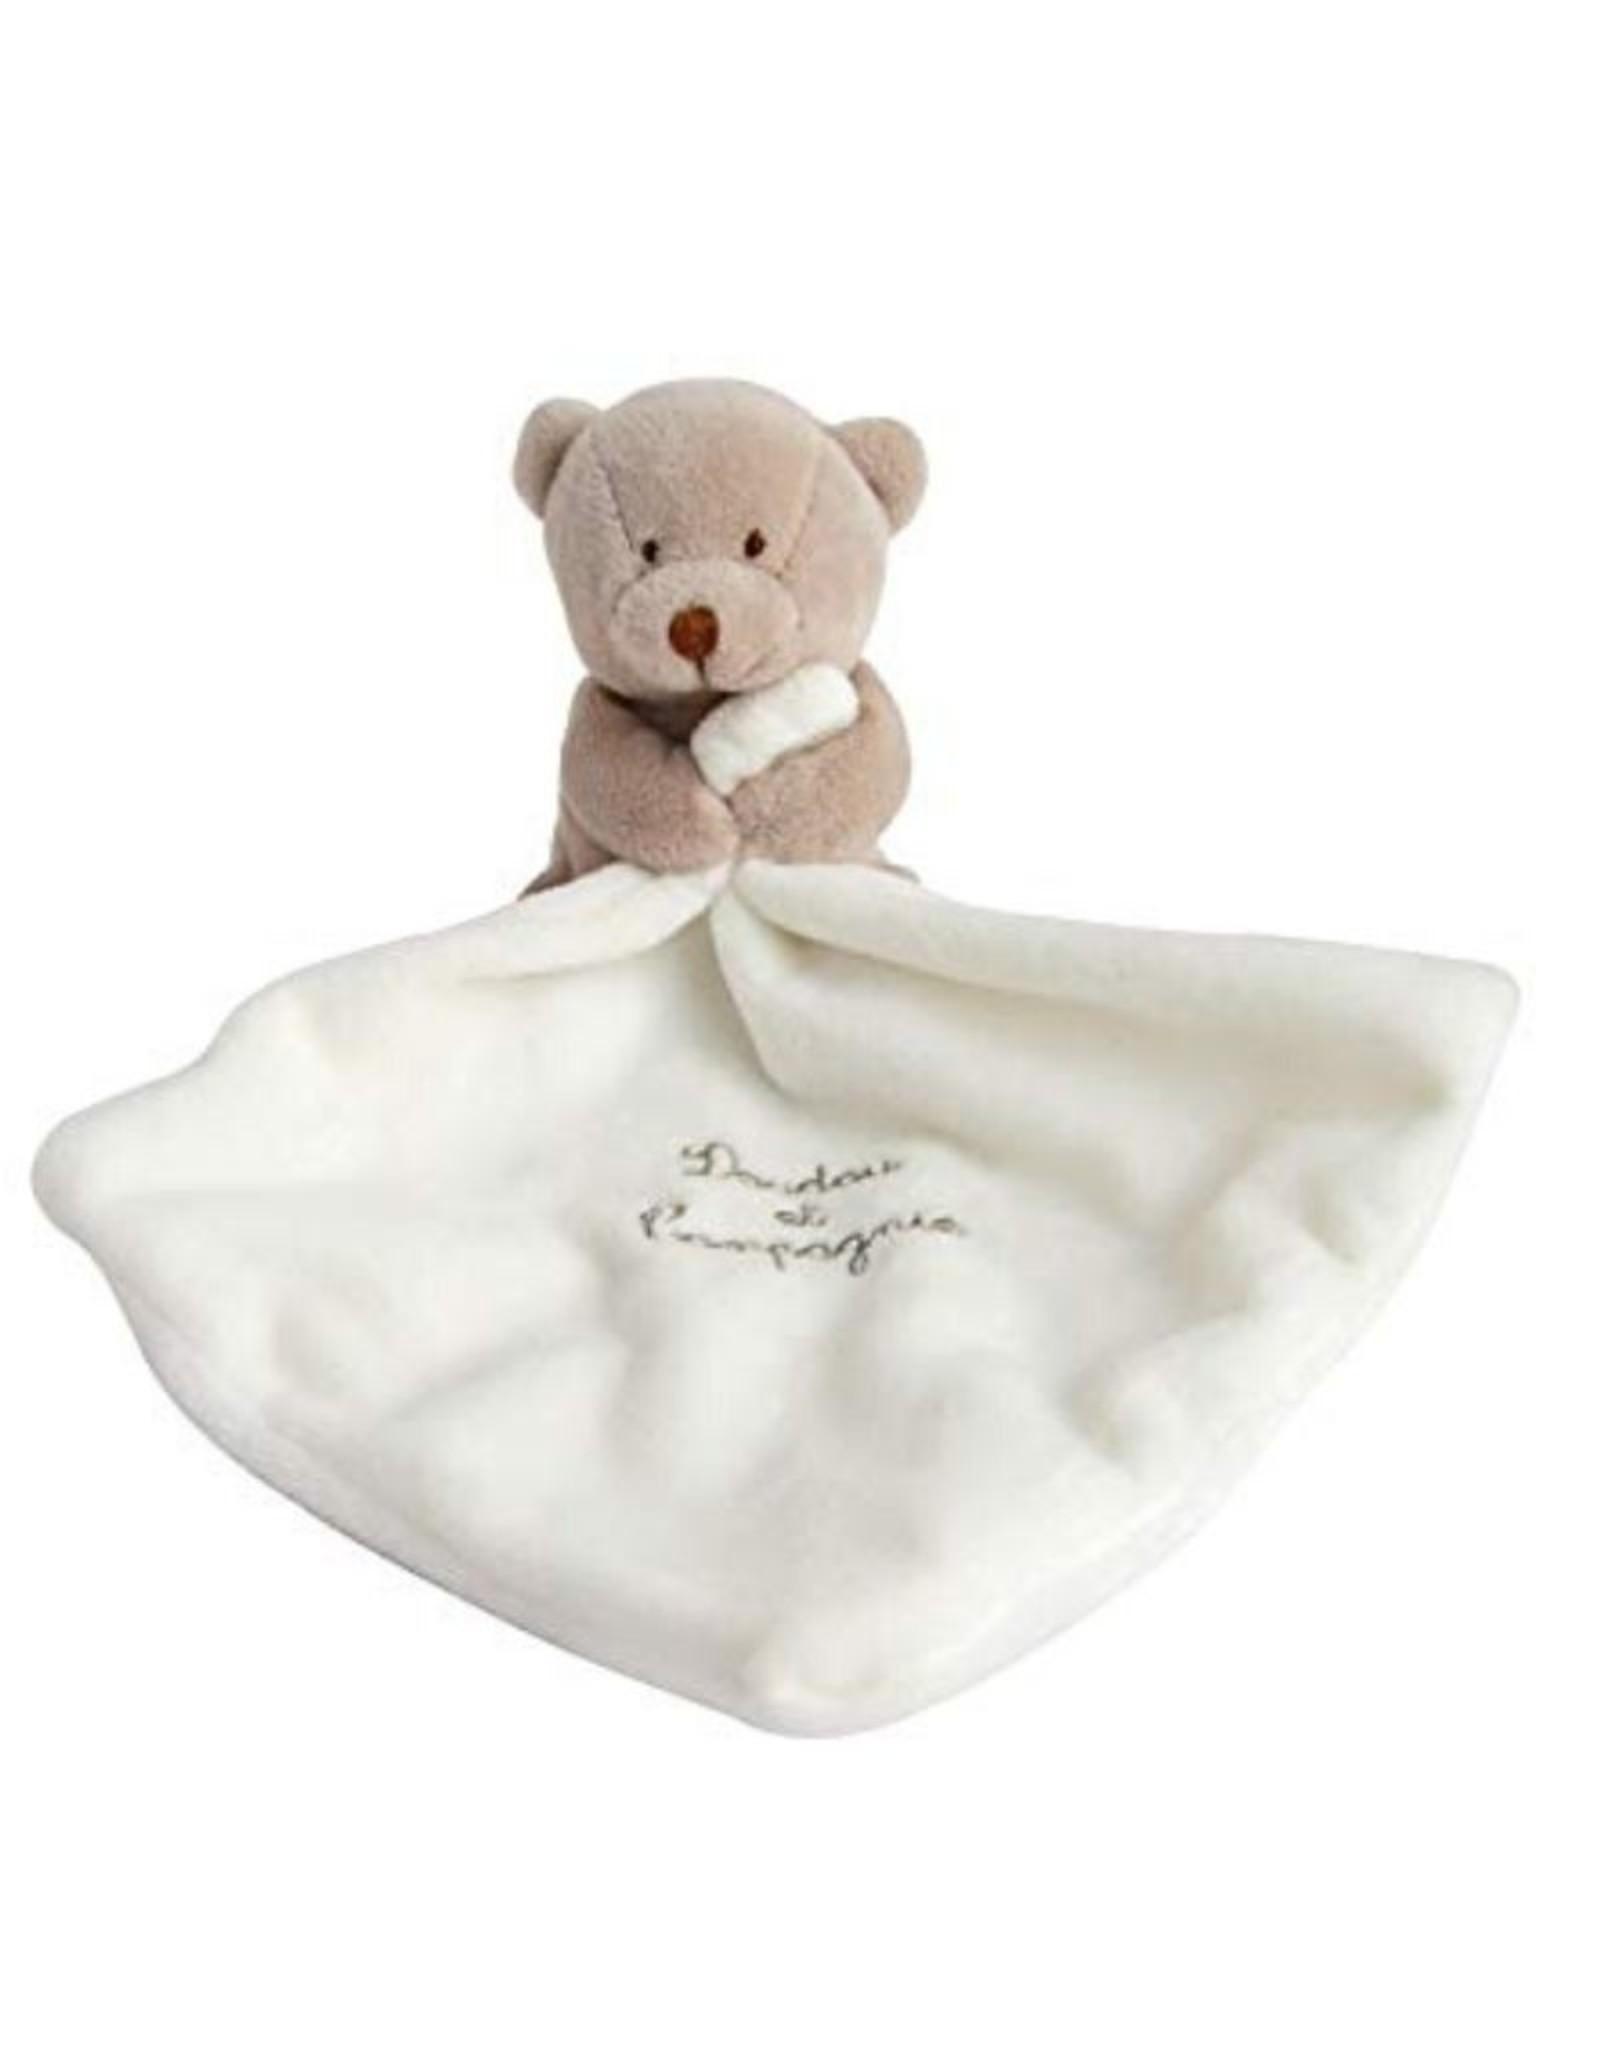 Doudou Bear with DouDou Flower Box